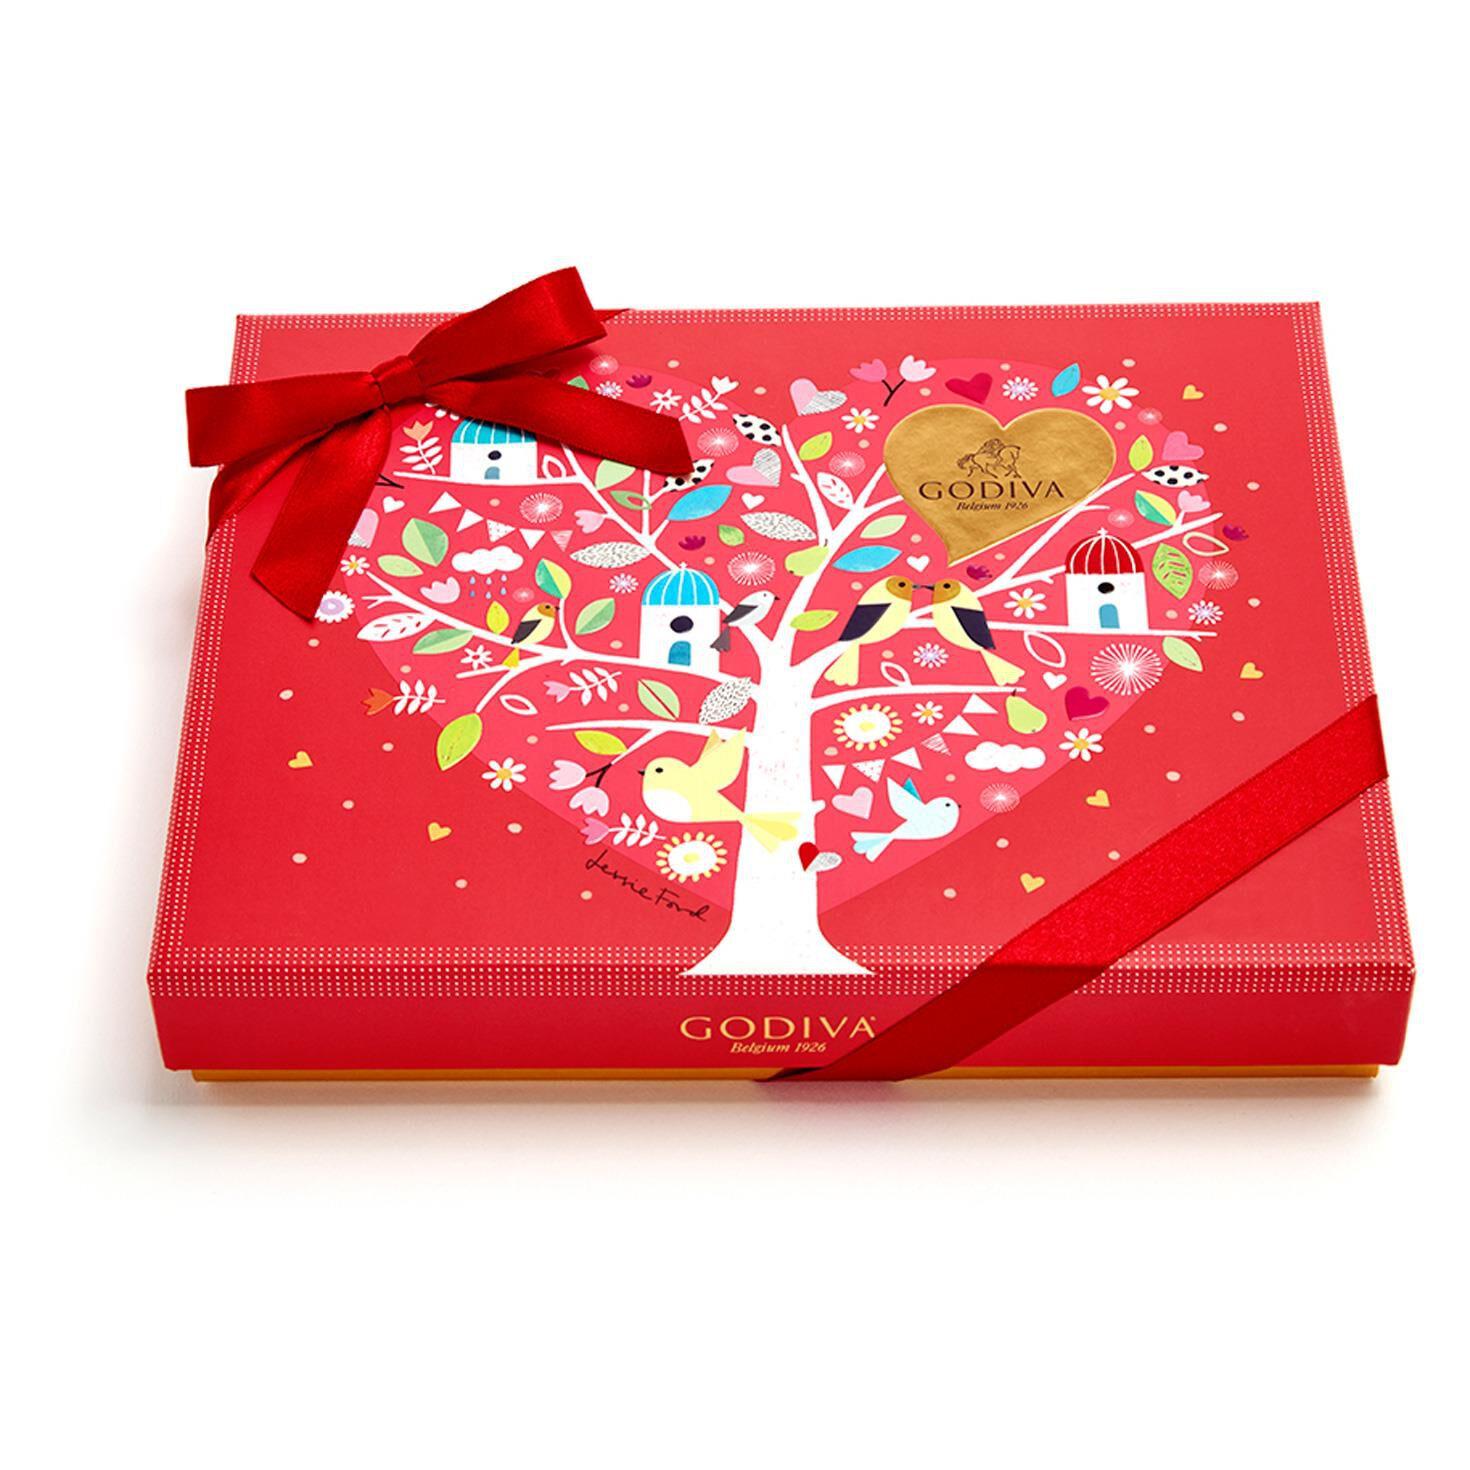 Godiva Chocolatier Assorted Chocolates 2018 Limited Edition ...